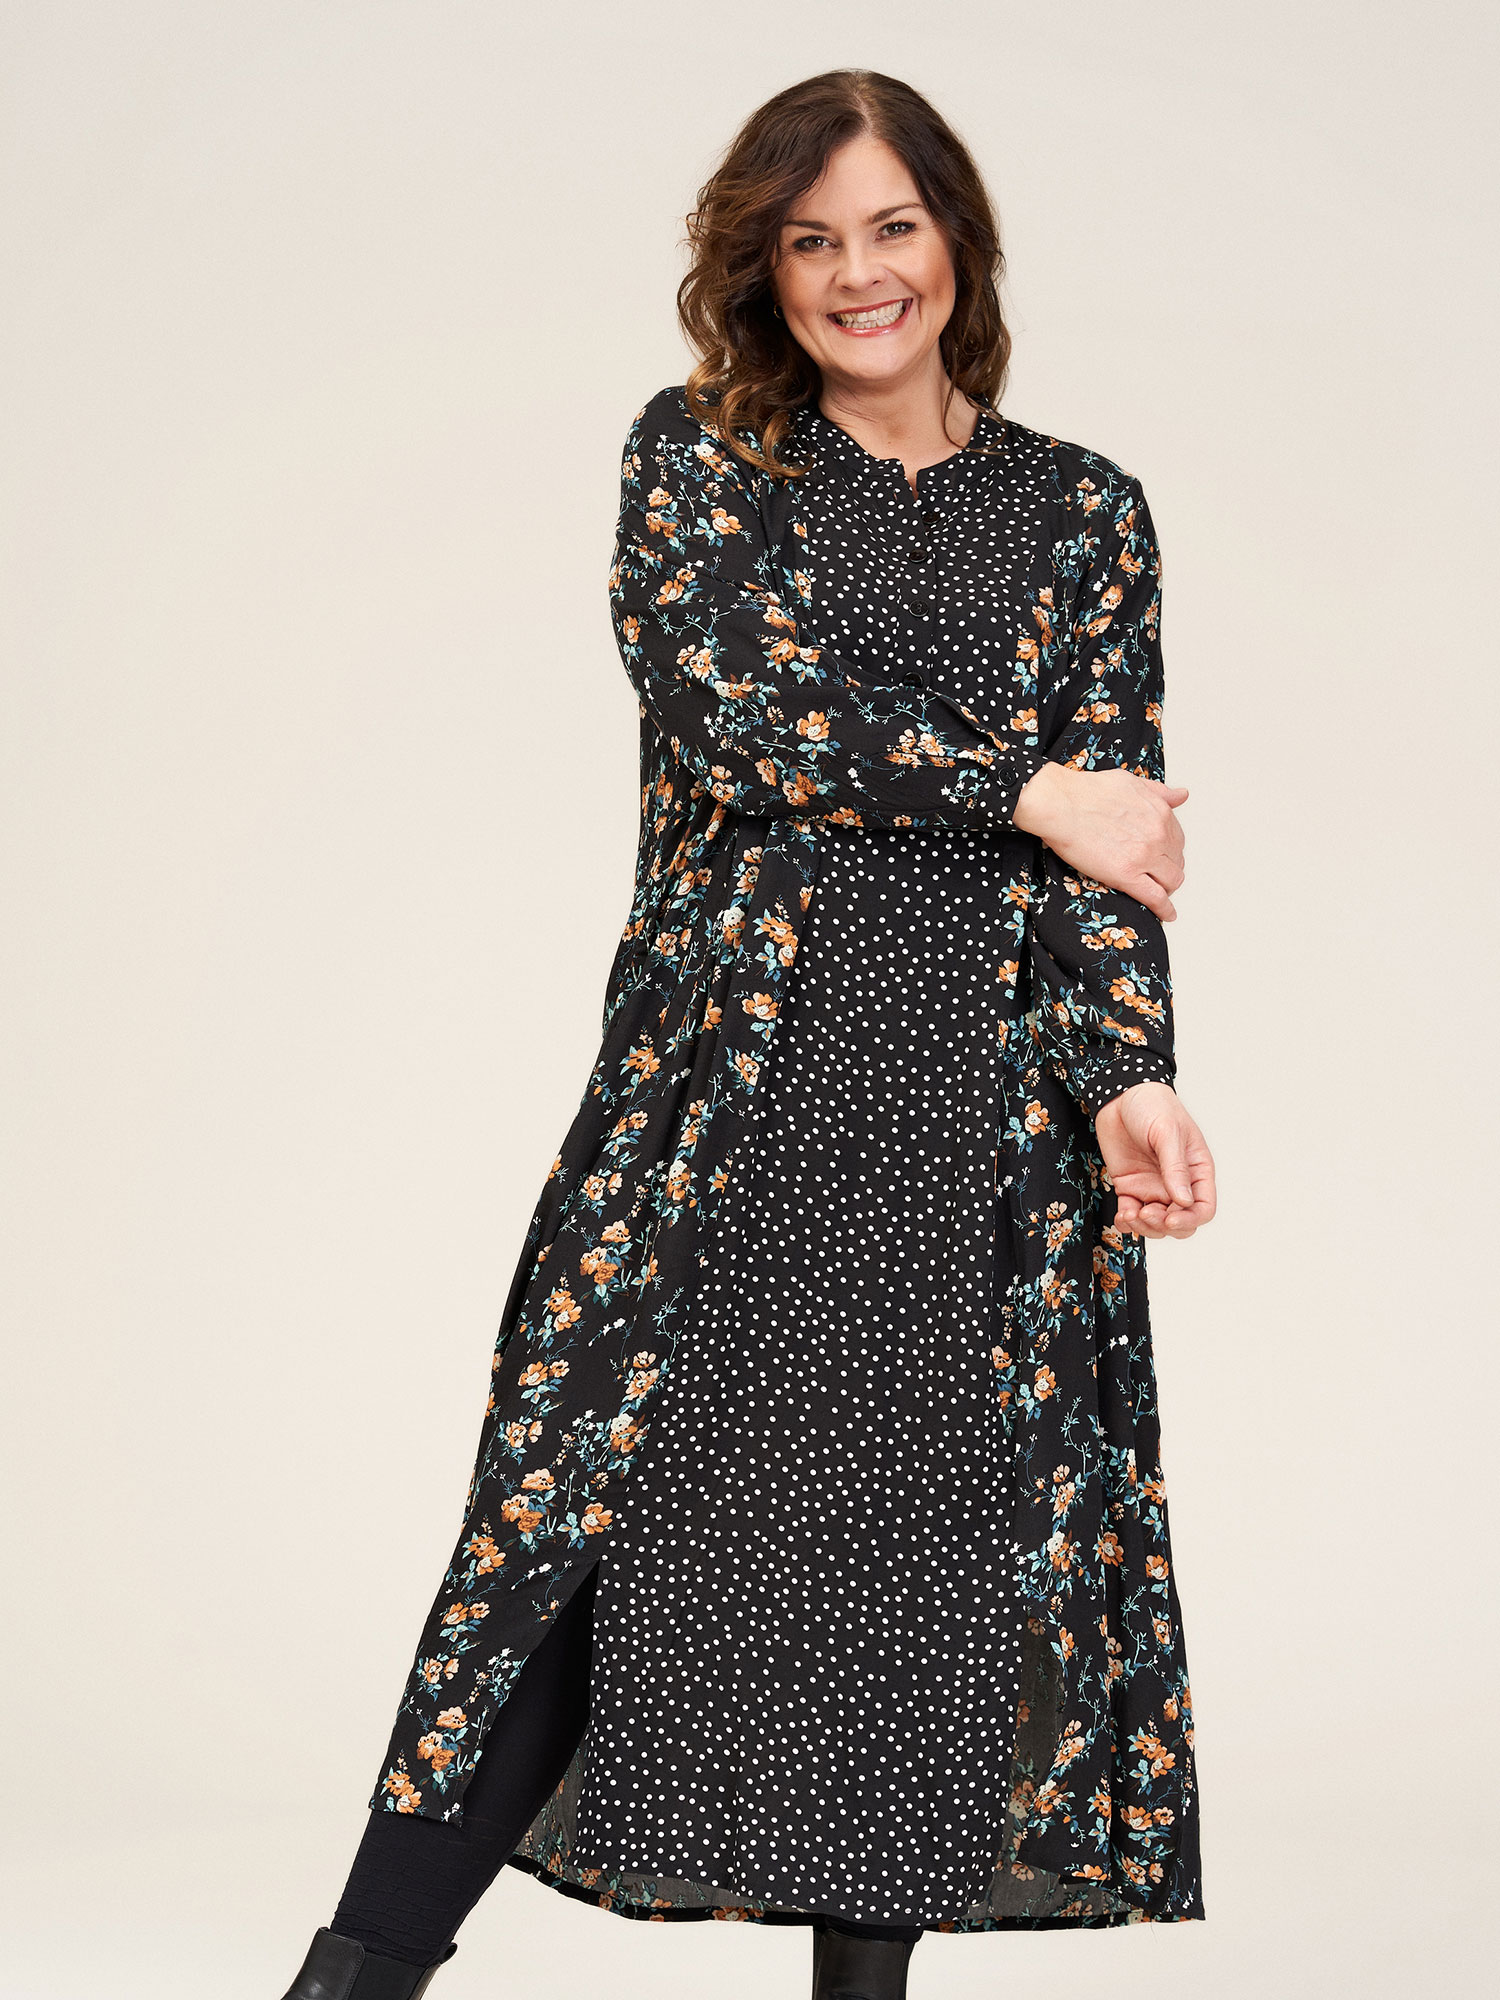 Gozzip Lang sort kjole med fine små prikker og smukt blomster print, 42-44 / S